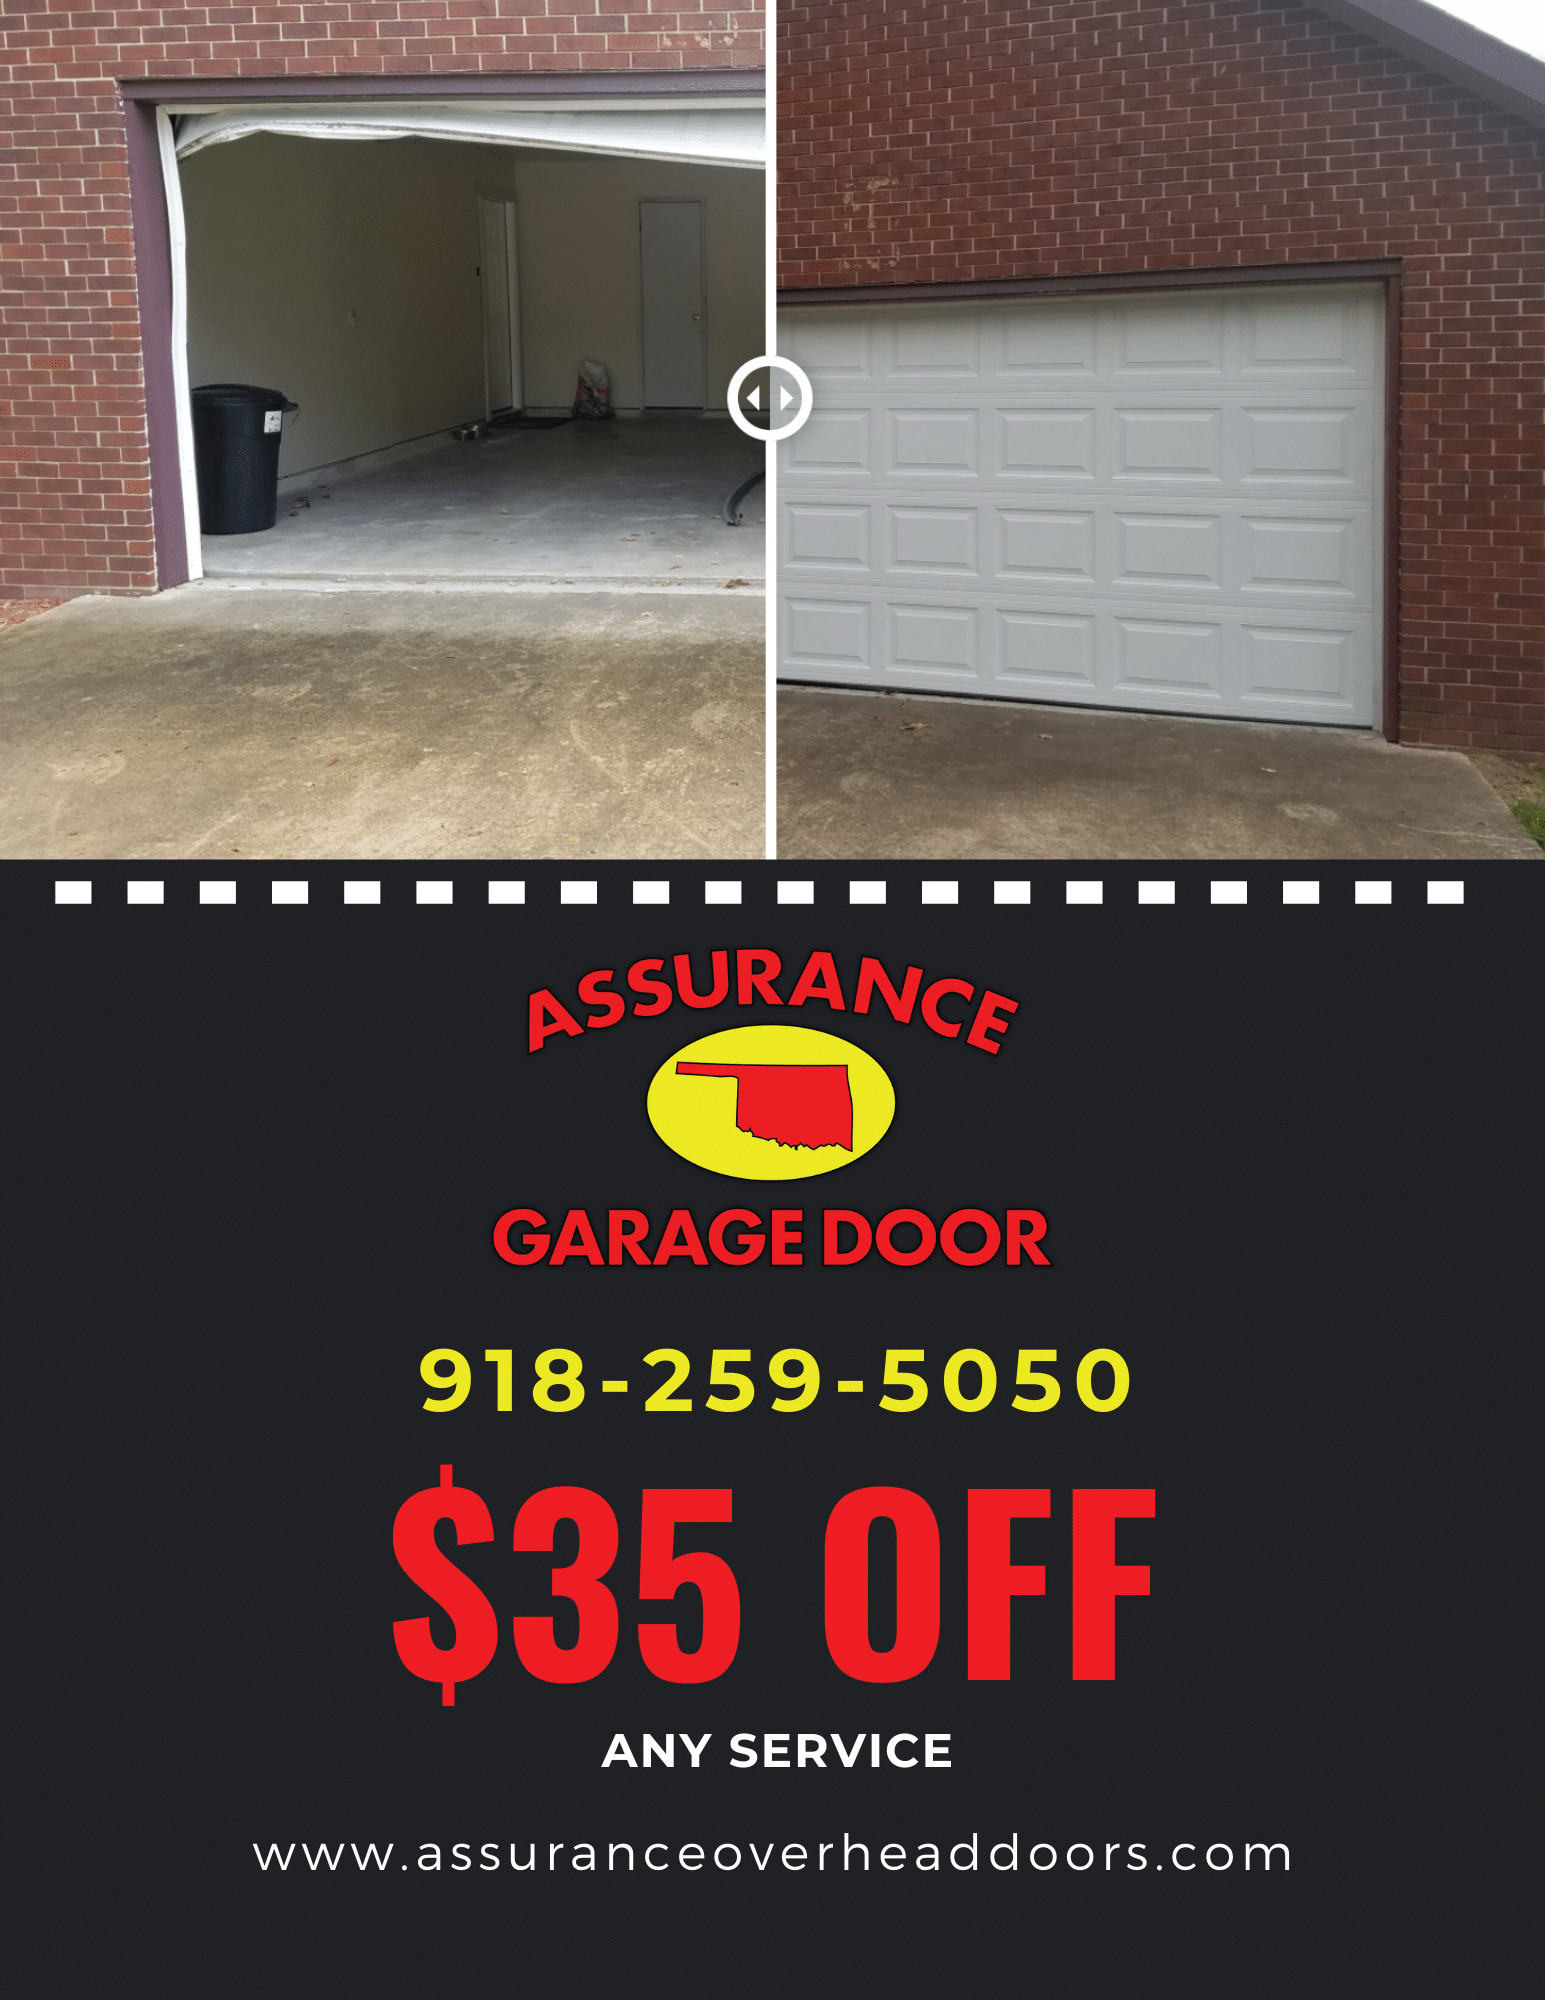 Assurance Garage Door - Coupon